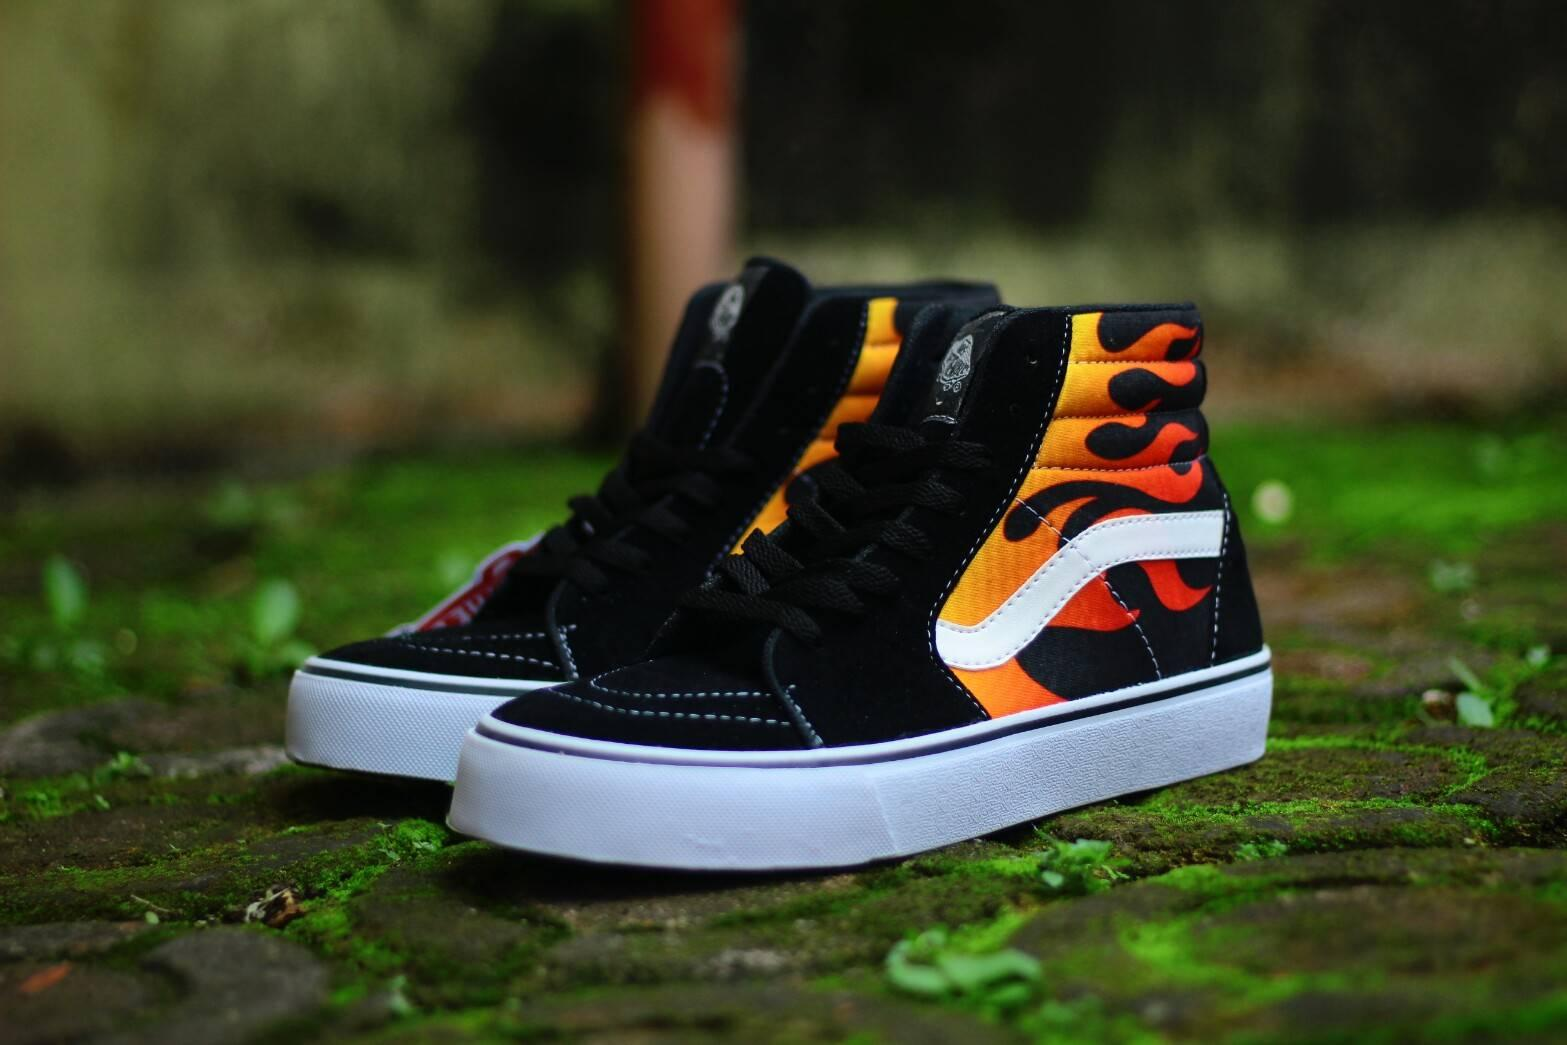 Sepatu Skate Casual Pria Vans SK8 High Cartoon Sneakers